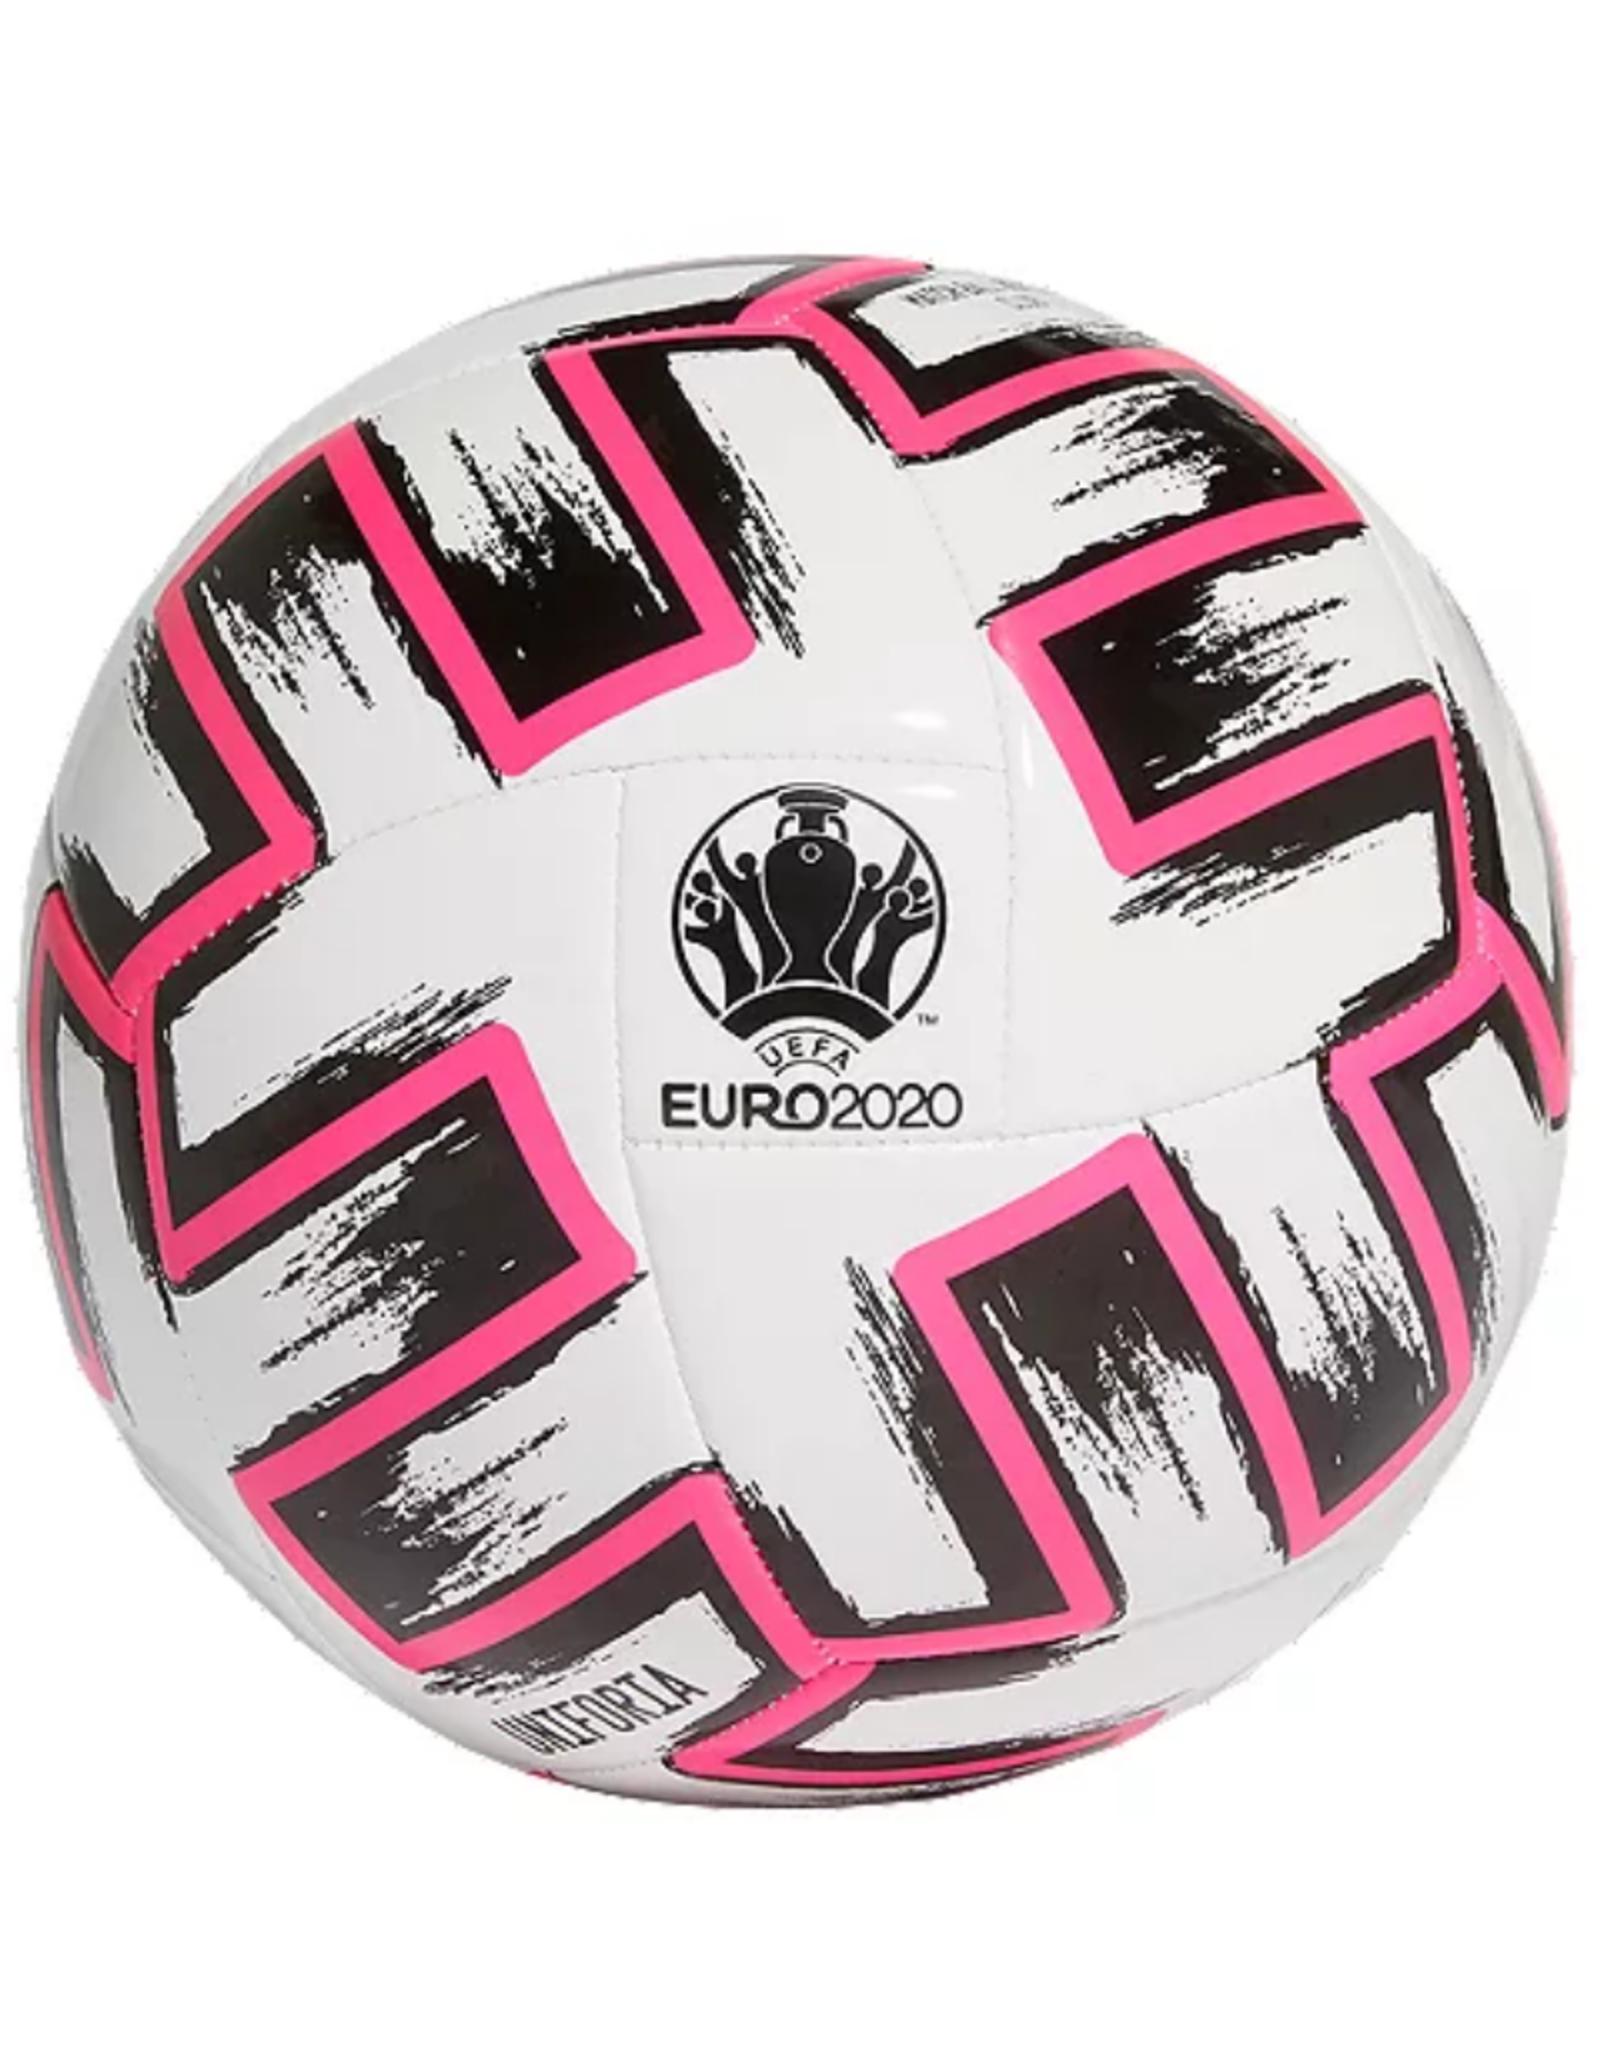 Adidas Adidas Euro 2020 Uniforia Club Soccer Ball Size 5 White/Pink